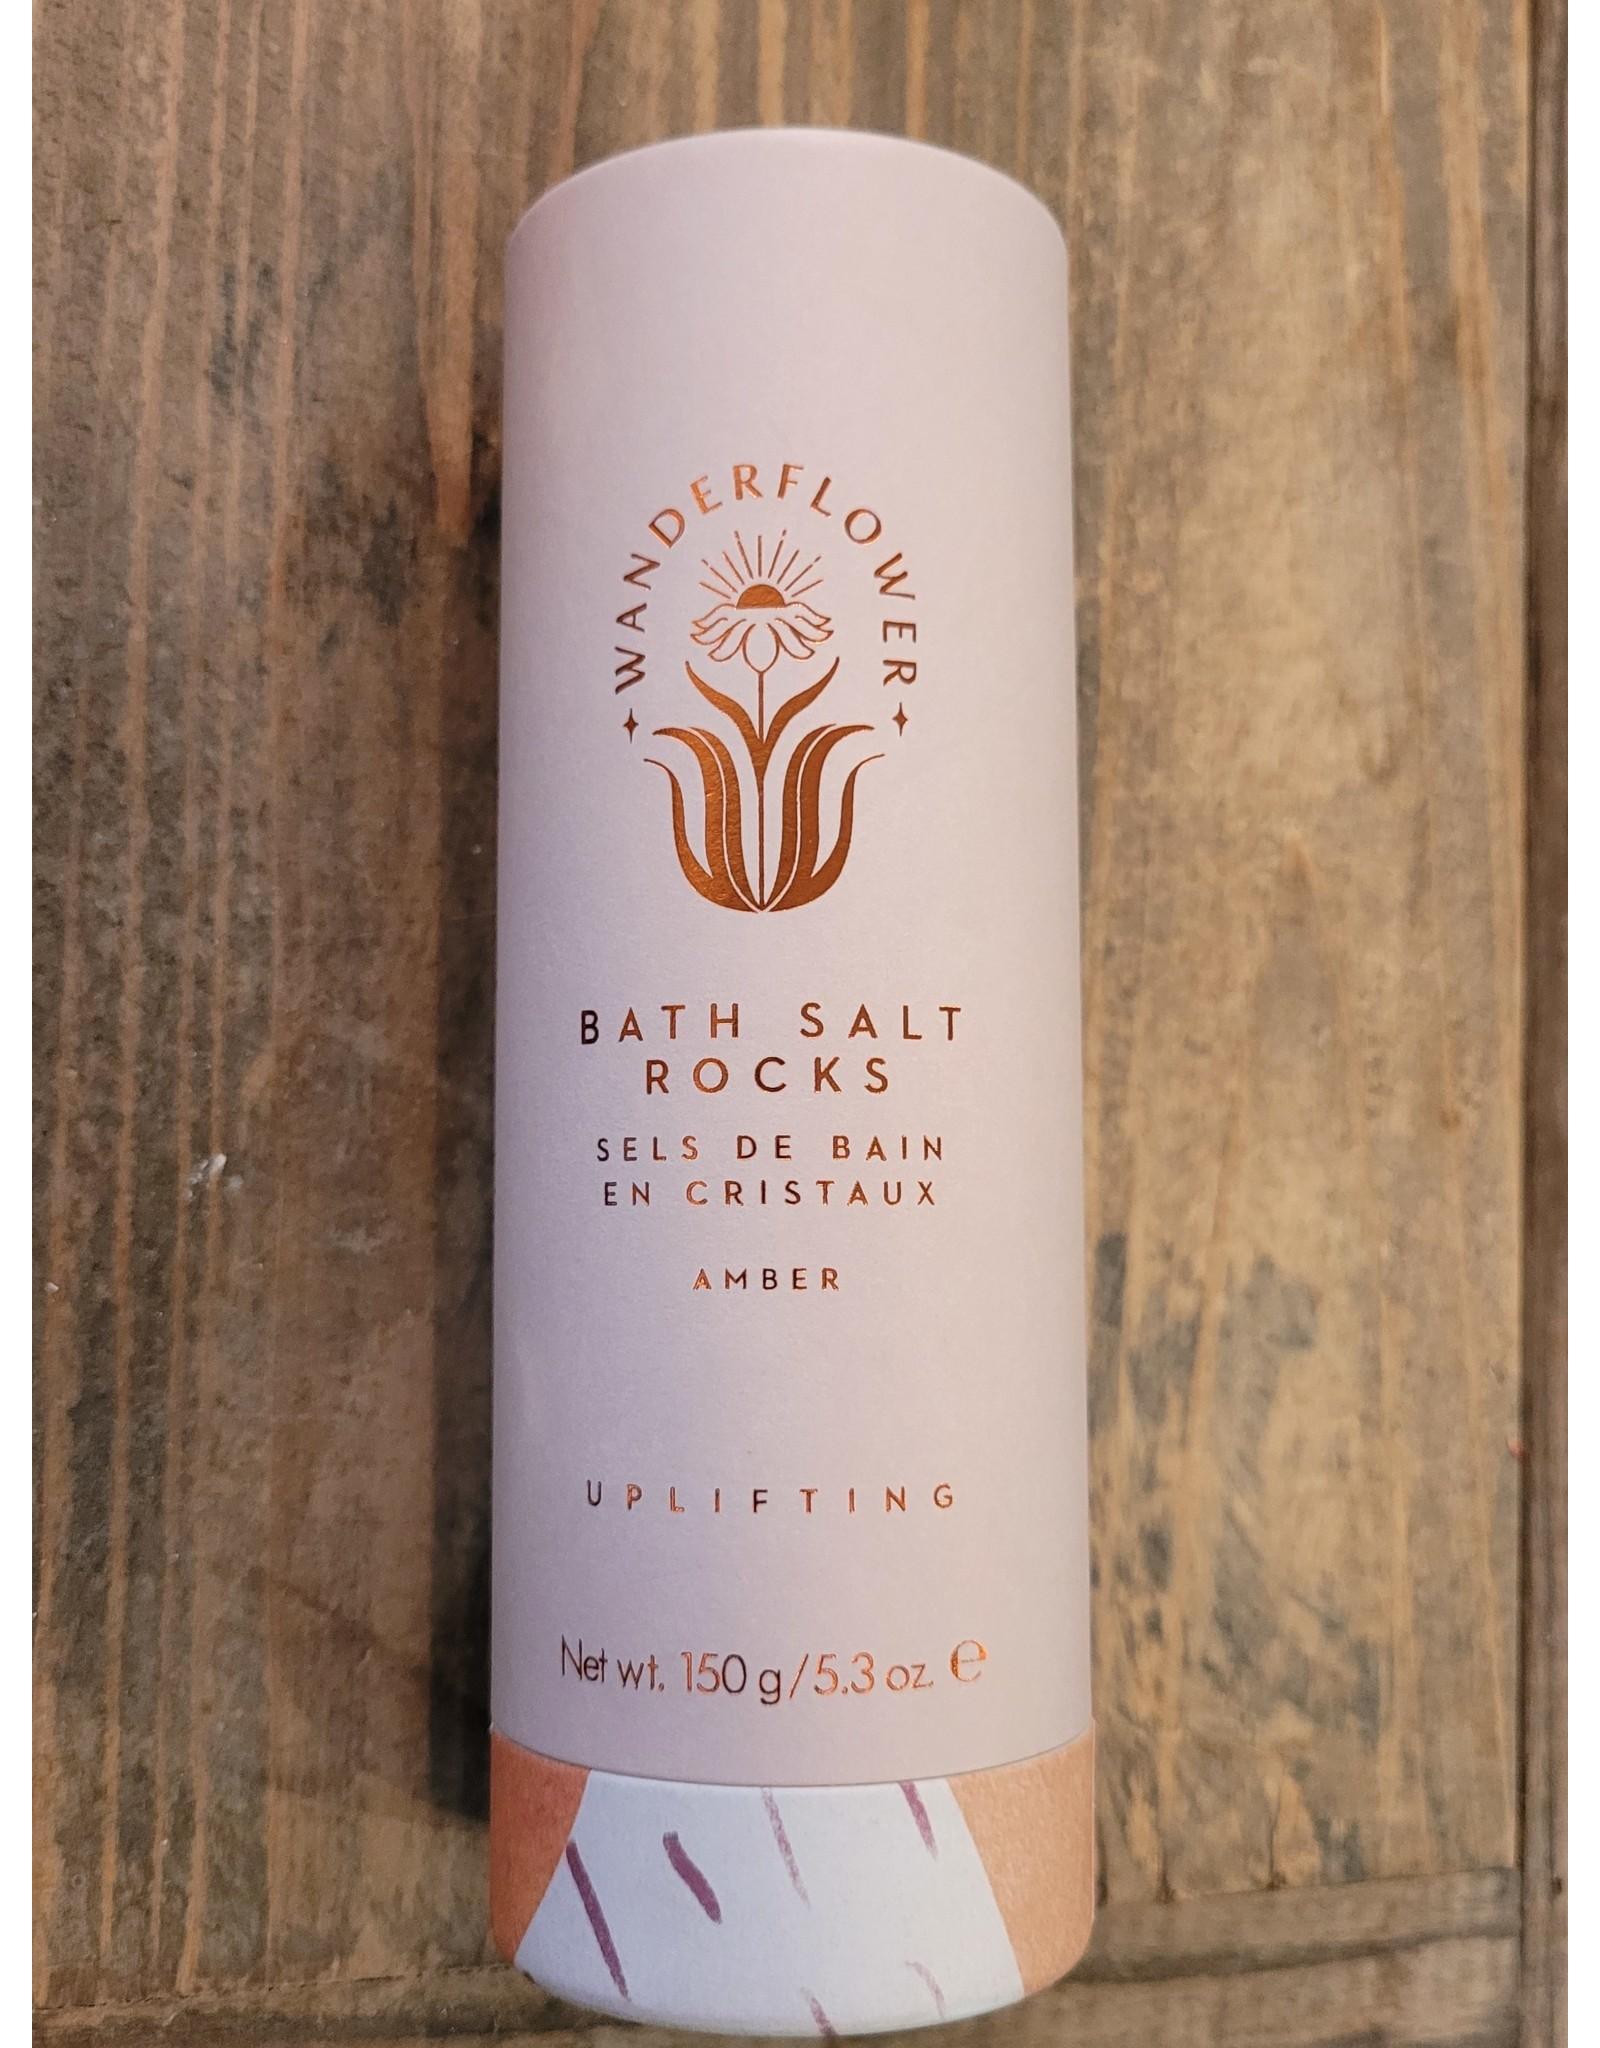 Upper Canada Soap Wanderflower Bath Salt Rocks